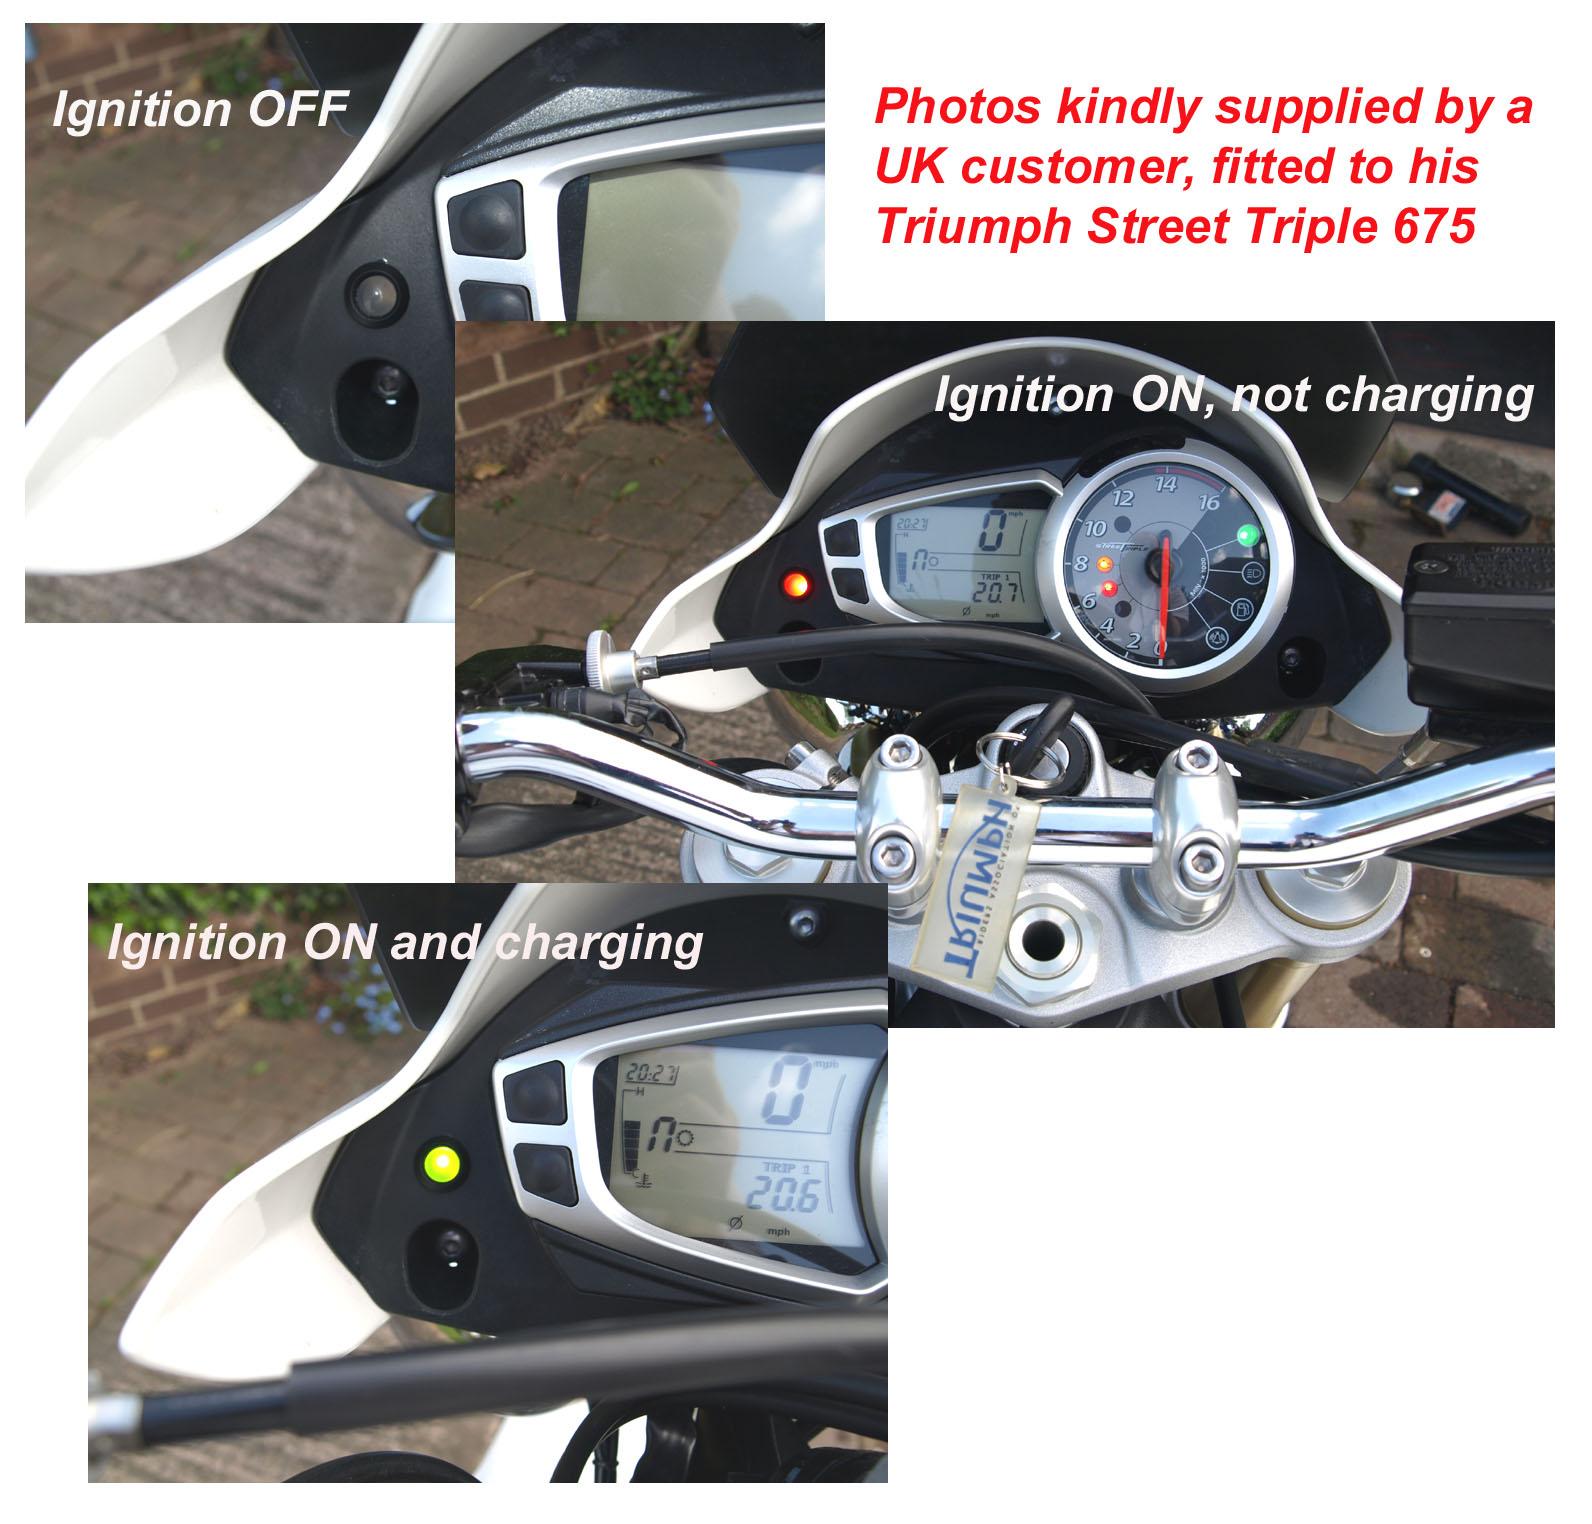 Icmcom Battery Alternator Ignition Warning Lights Charge Monitors Free Harley Davidson Wiring Diagrams 2011 Triumph Street Triple 675 Light